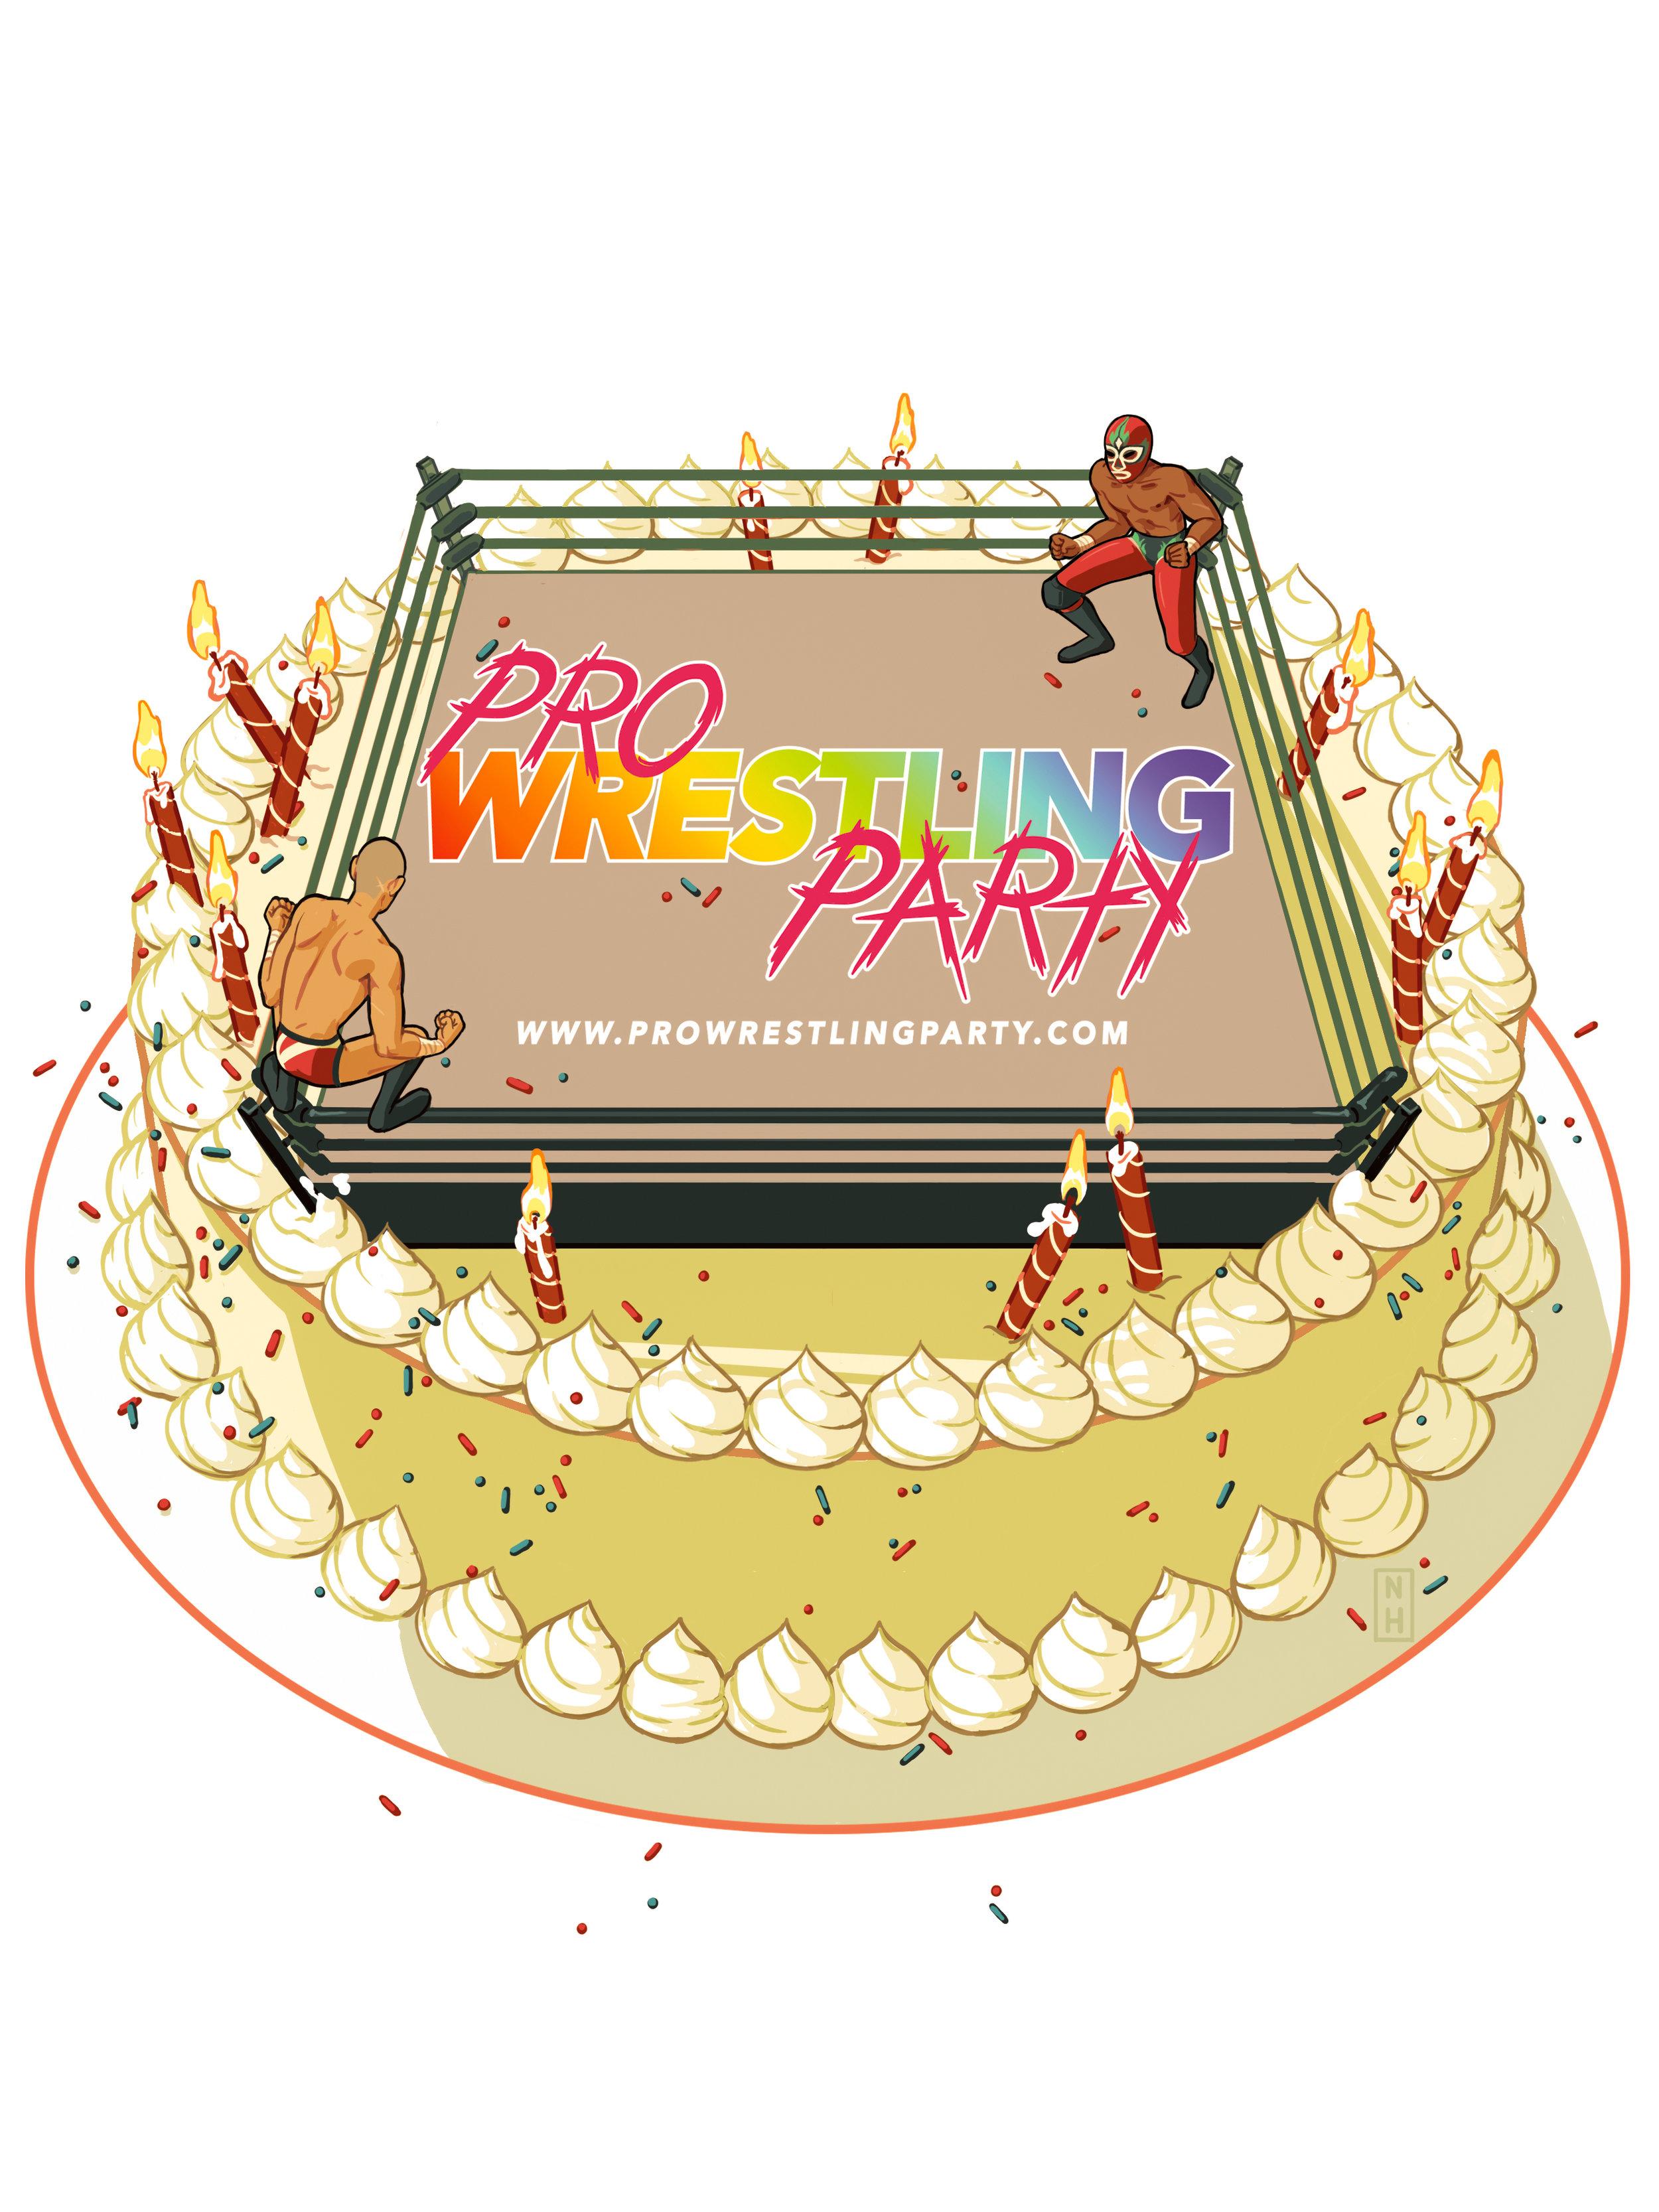 PRO_WRESTLING_PARTY_AD.jpg